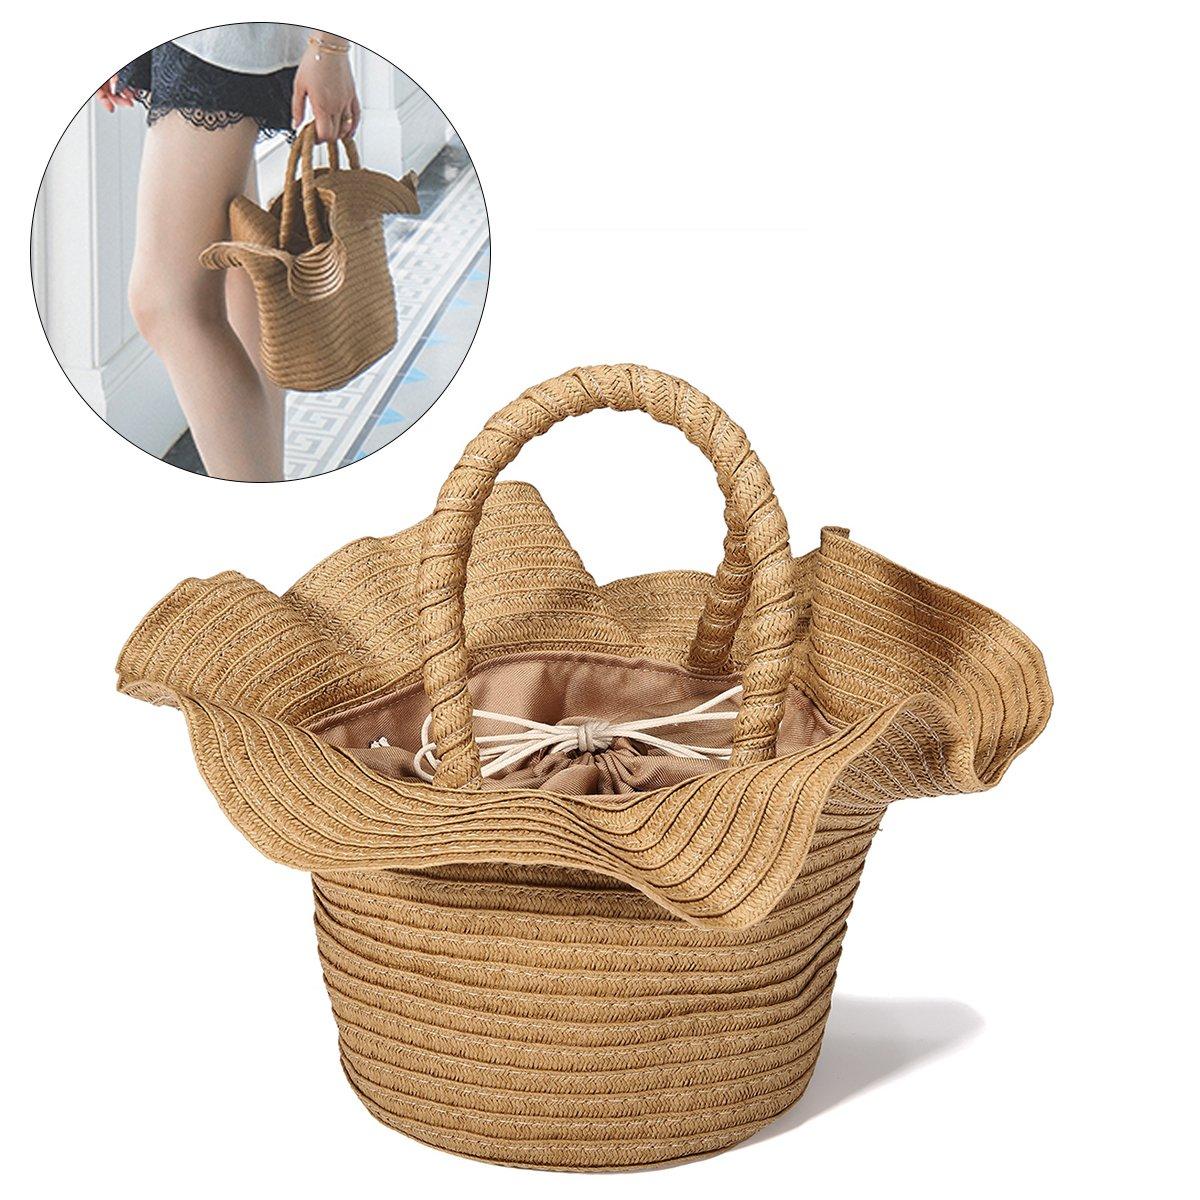 Straw Summer Beach Bags, JOSEKO Women Handbag Tote Fashion Shopper Basket Ladies Purse for Travel Coffee 7.08''x 5.9''(LxH)